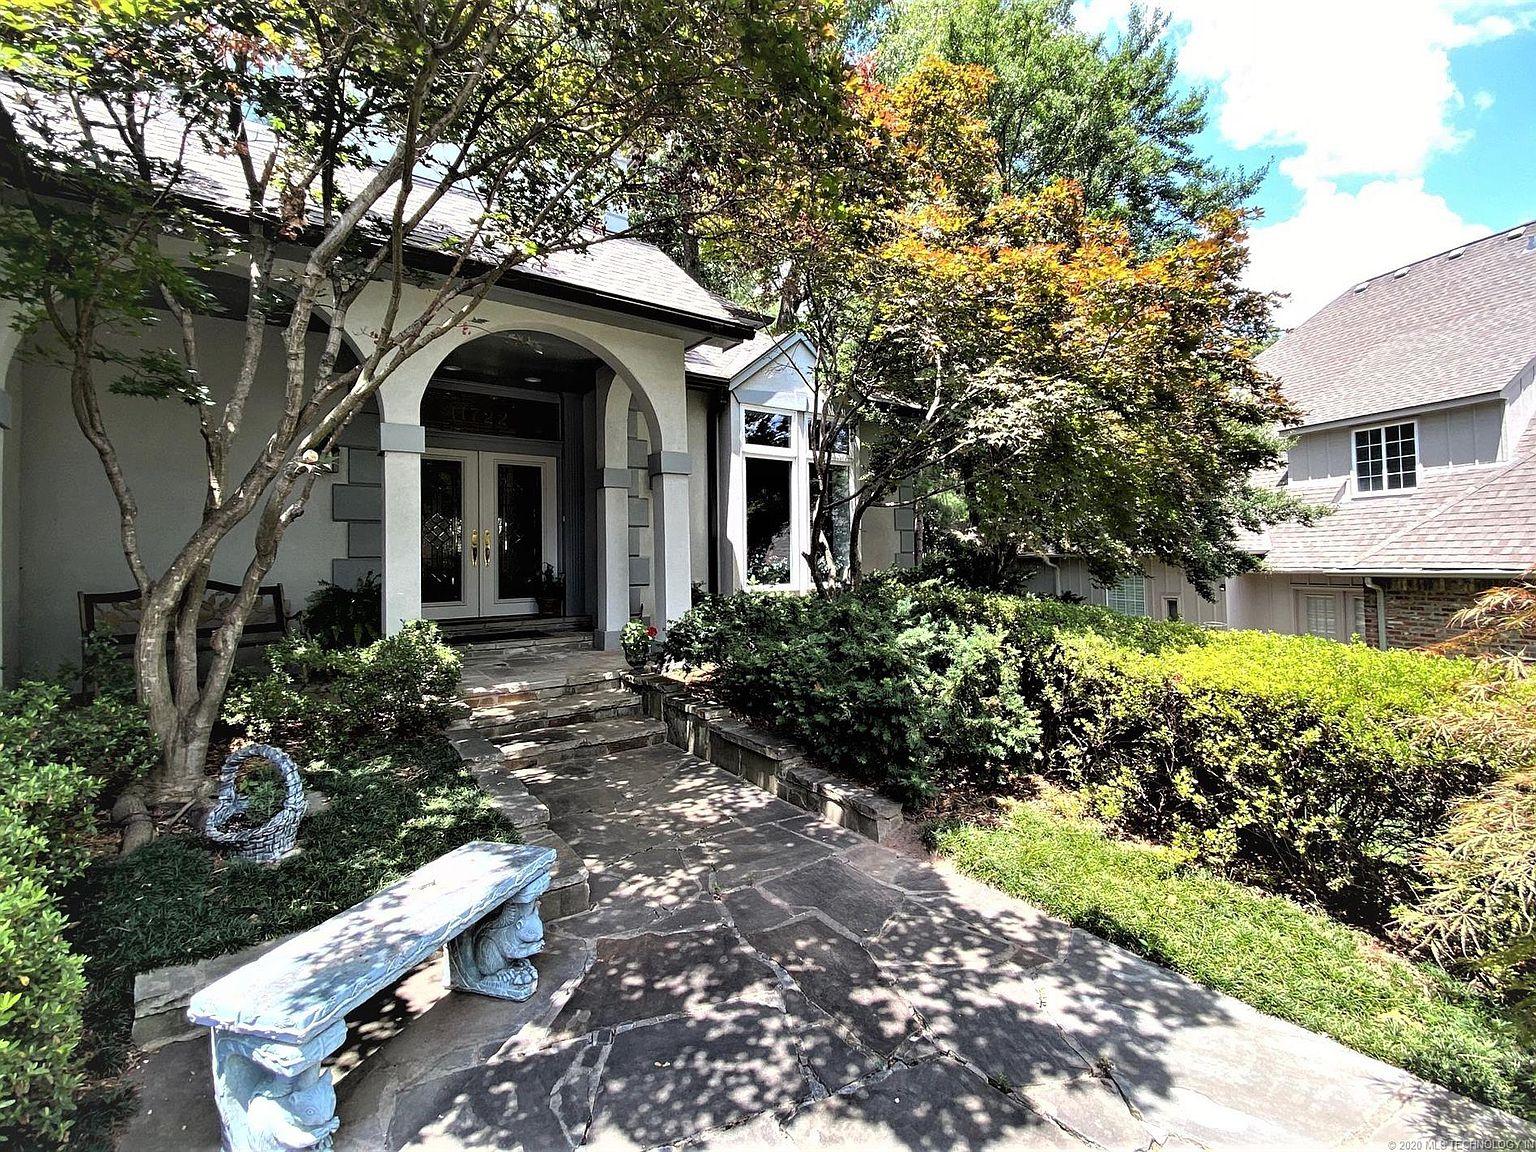 11722 S Granite Ave Tulsa Ok 74137 Zillow